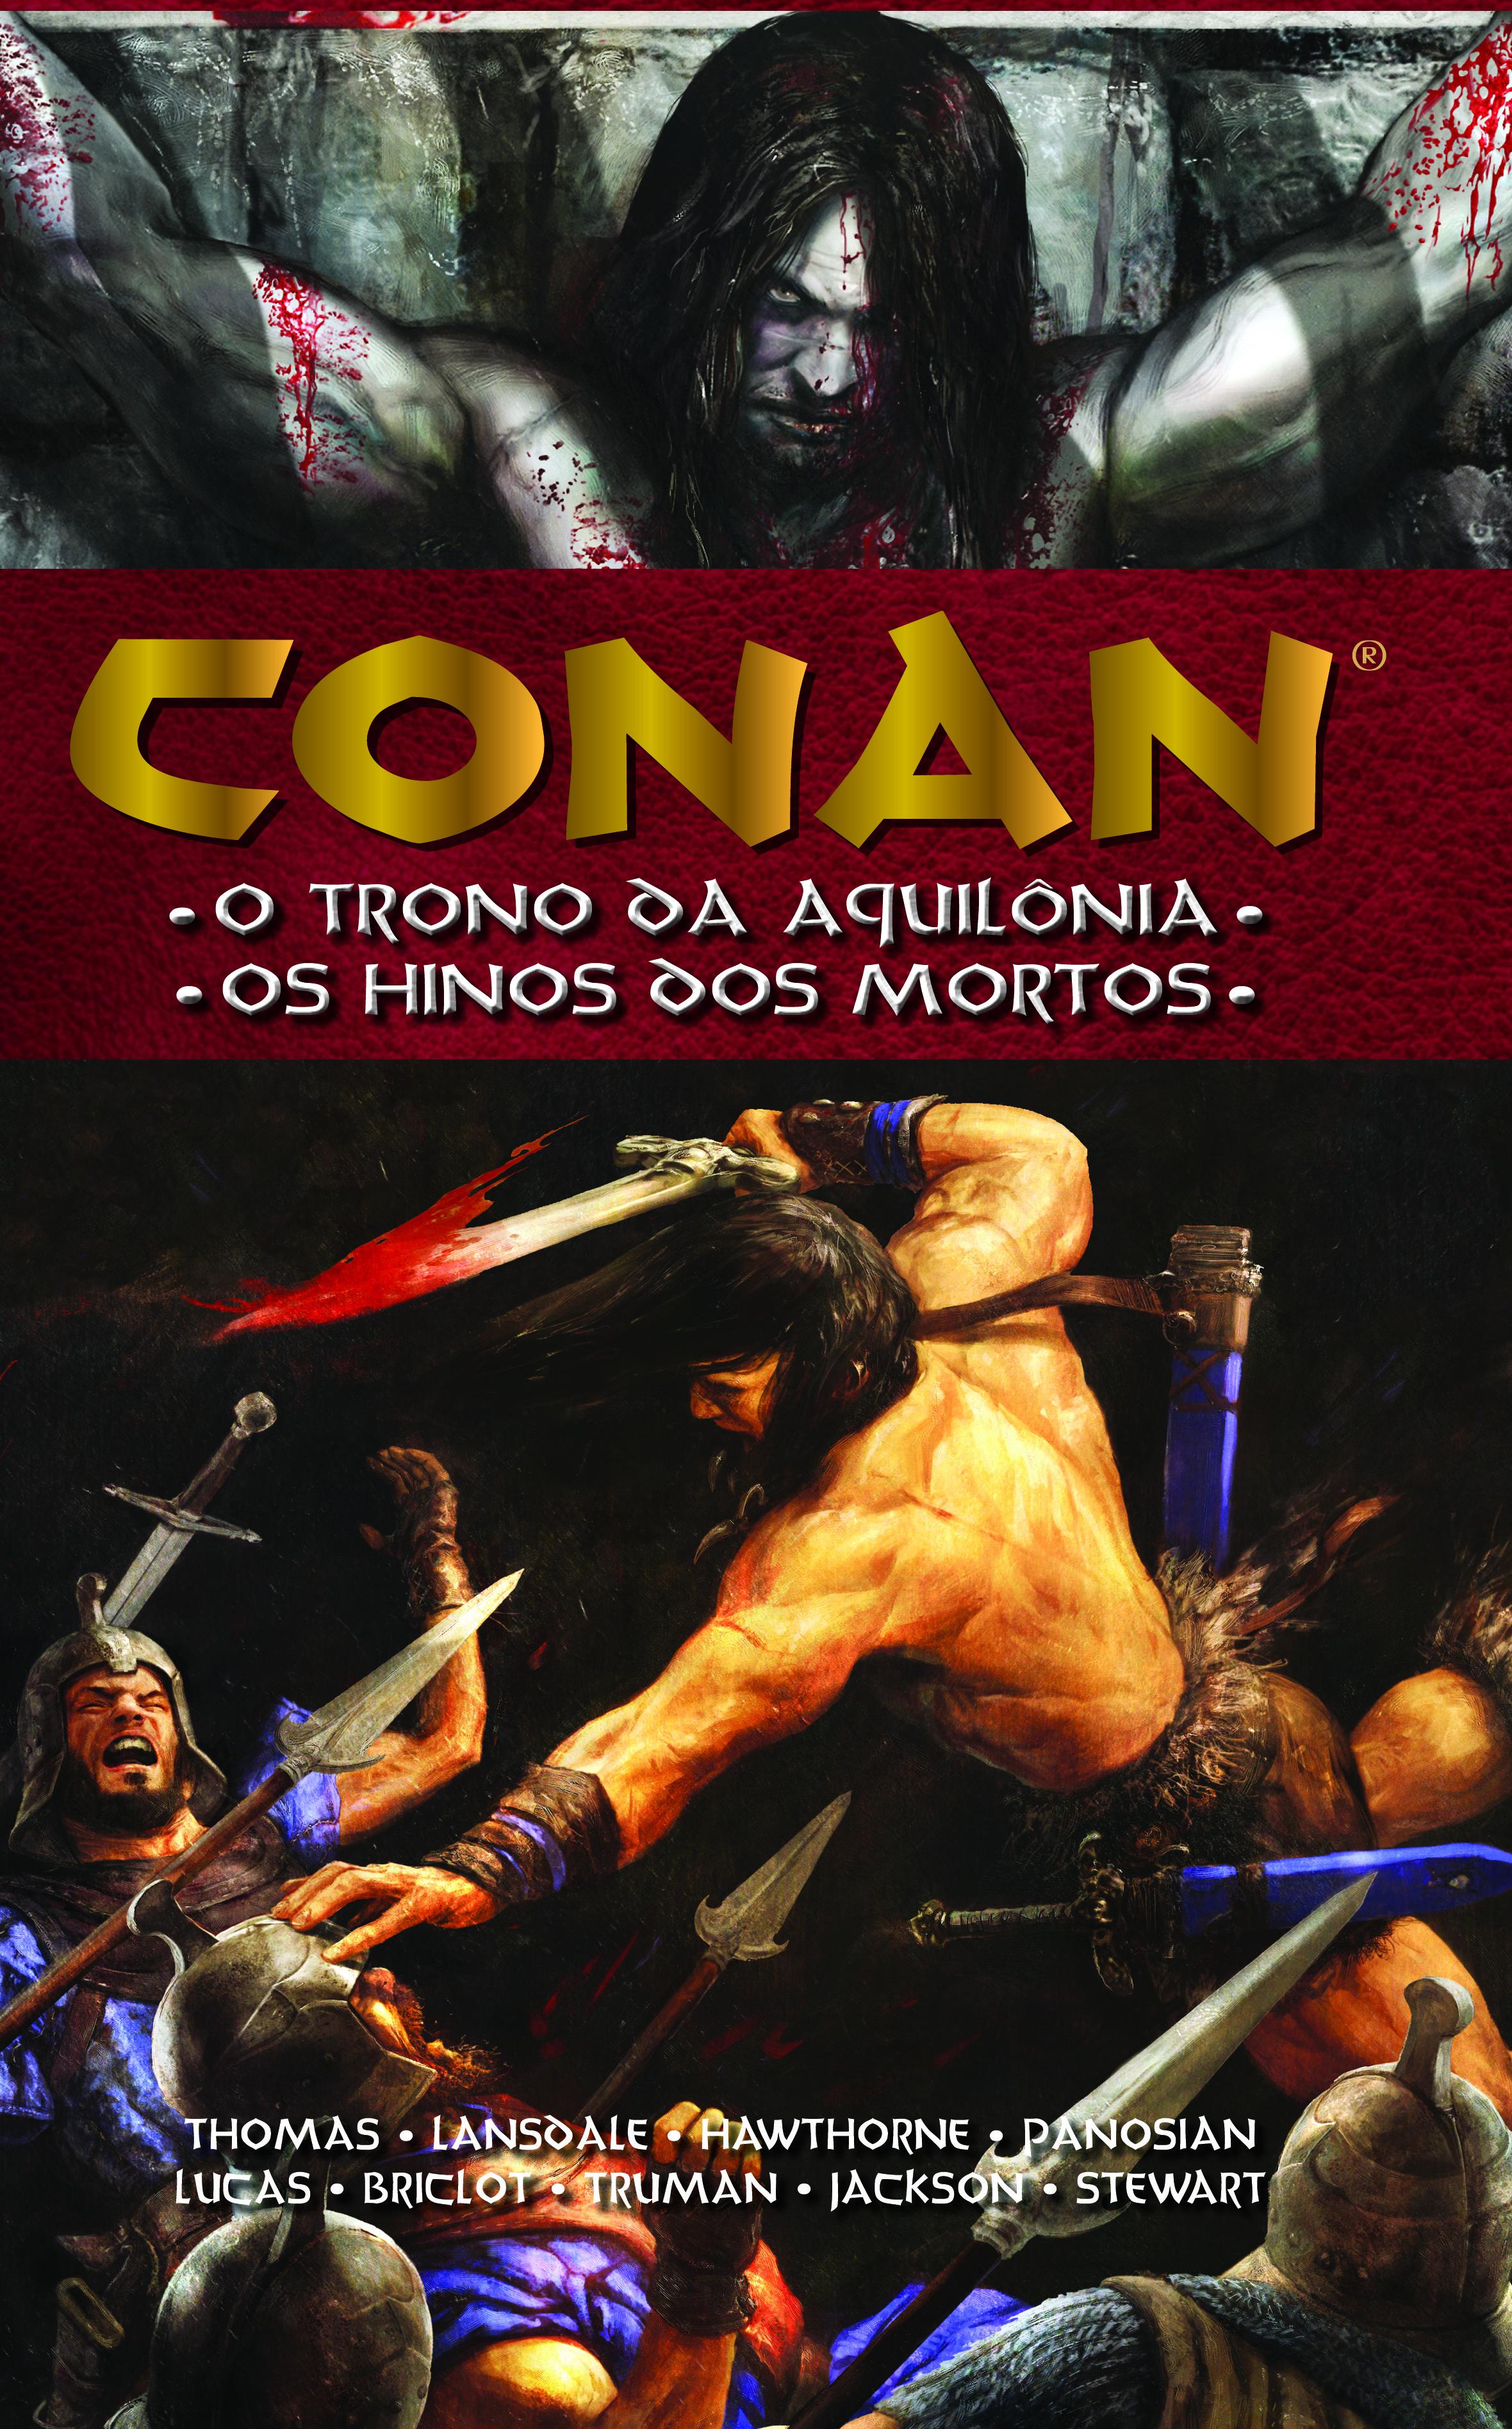 CONAN VOL. 12 - O TRONO DA AQUILÔNIA